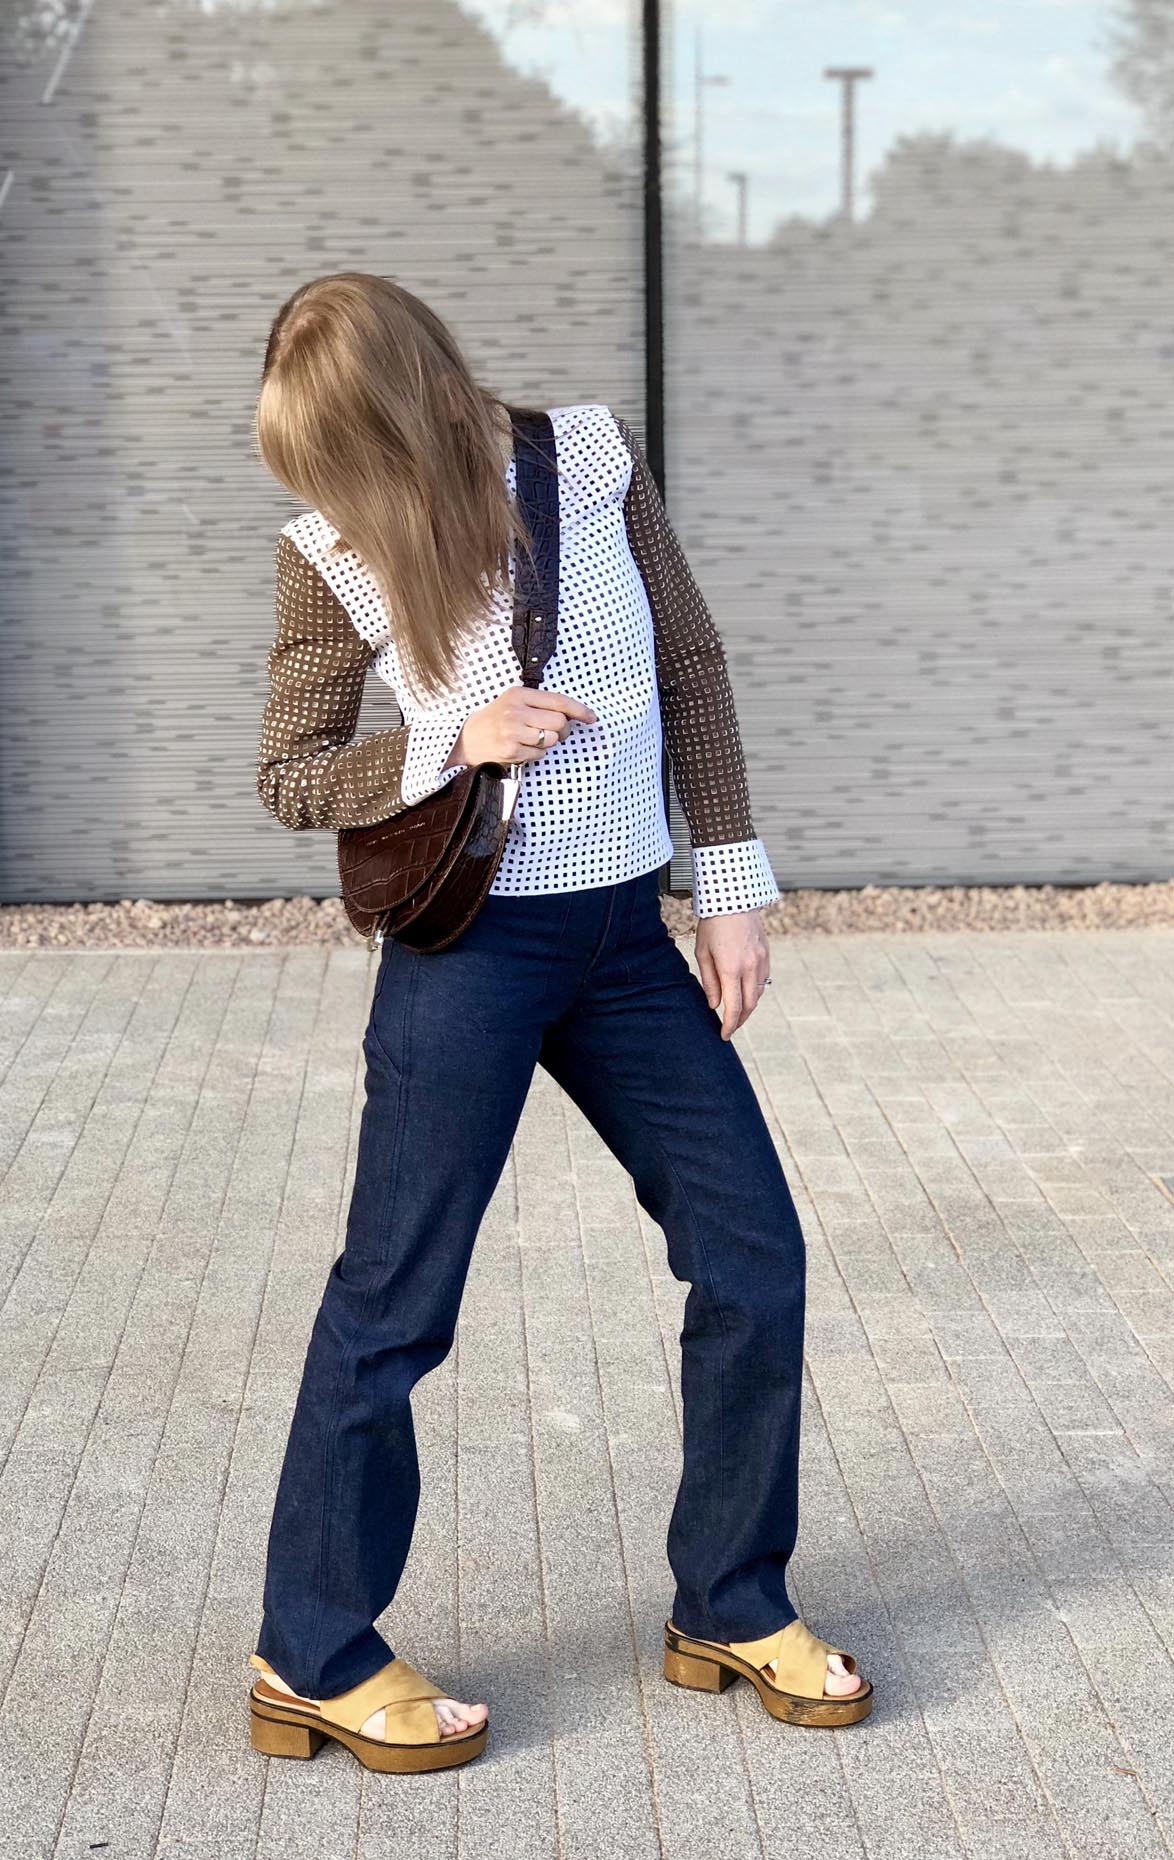 flared acne jeans, jw anderson top, saddle bag zofia chylak, vagabond shoes by fashion art media